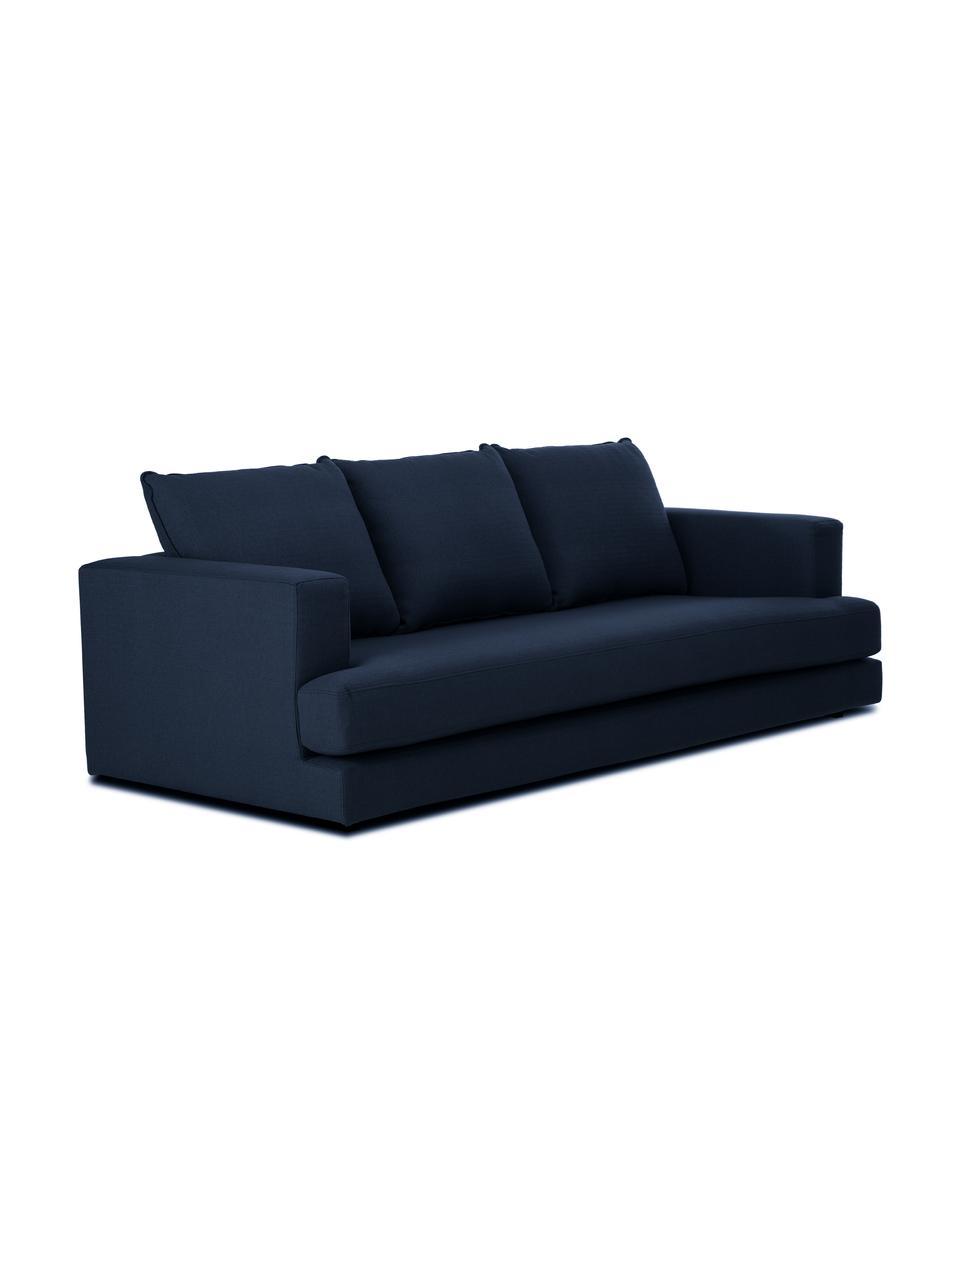 Sofa Tribeca (3-Sitzer) in Dunkelblau, Bezug: 100% Polyester Der hochwe, Gestell: Massives Buchenholz, Füße: Massives Buchenholz, lack, Webstoff Dunkelblau, B 228 x T 104 cm